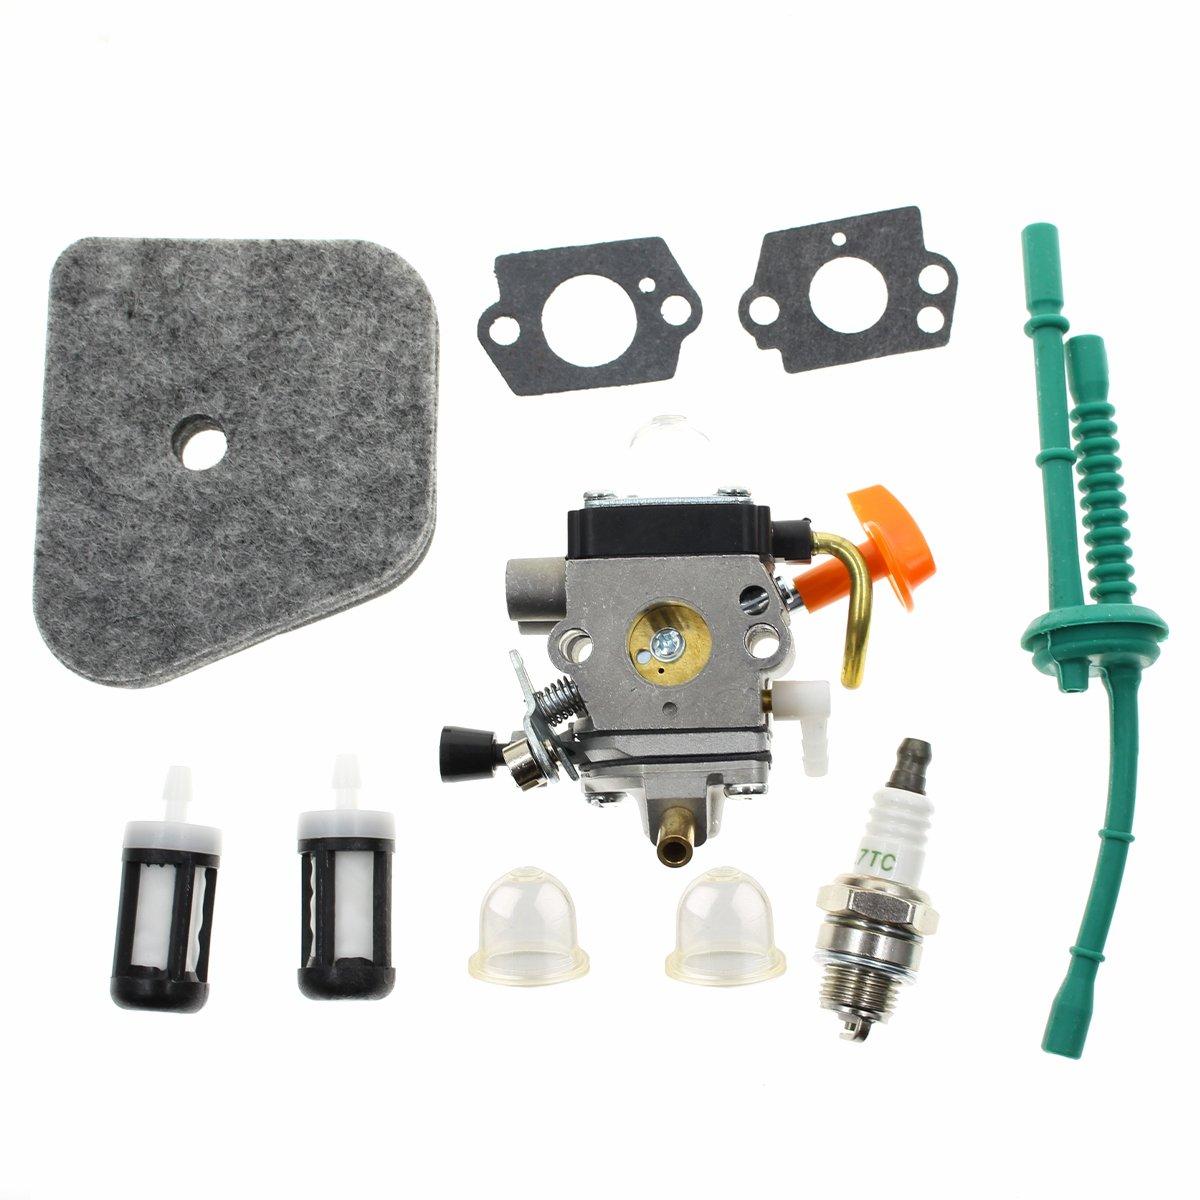 Carbhub Carburetor for STIHL FS100 FS100R FS110 FS110R FS110X FS110RX FS100RX FS130 FS130R Trimmer with Fuel Line Tune Up Kit